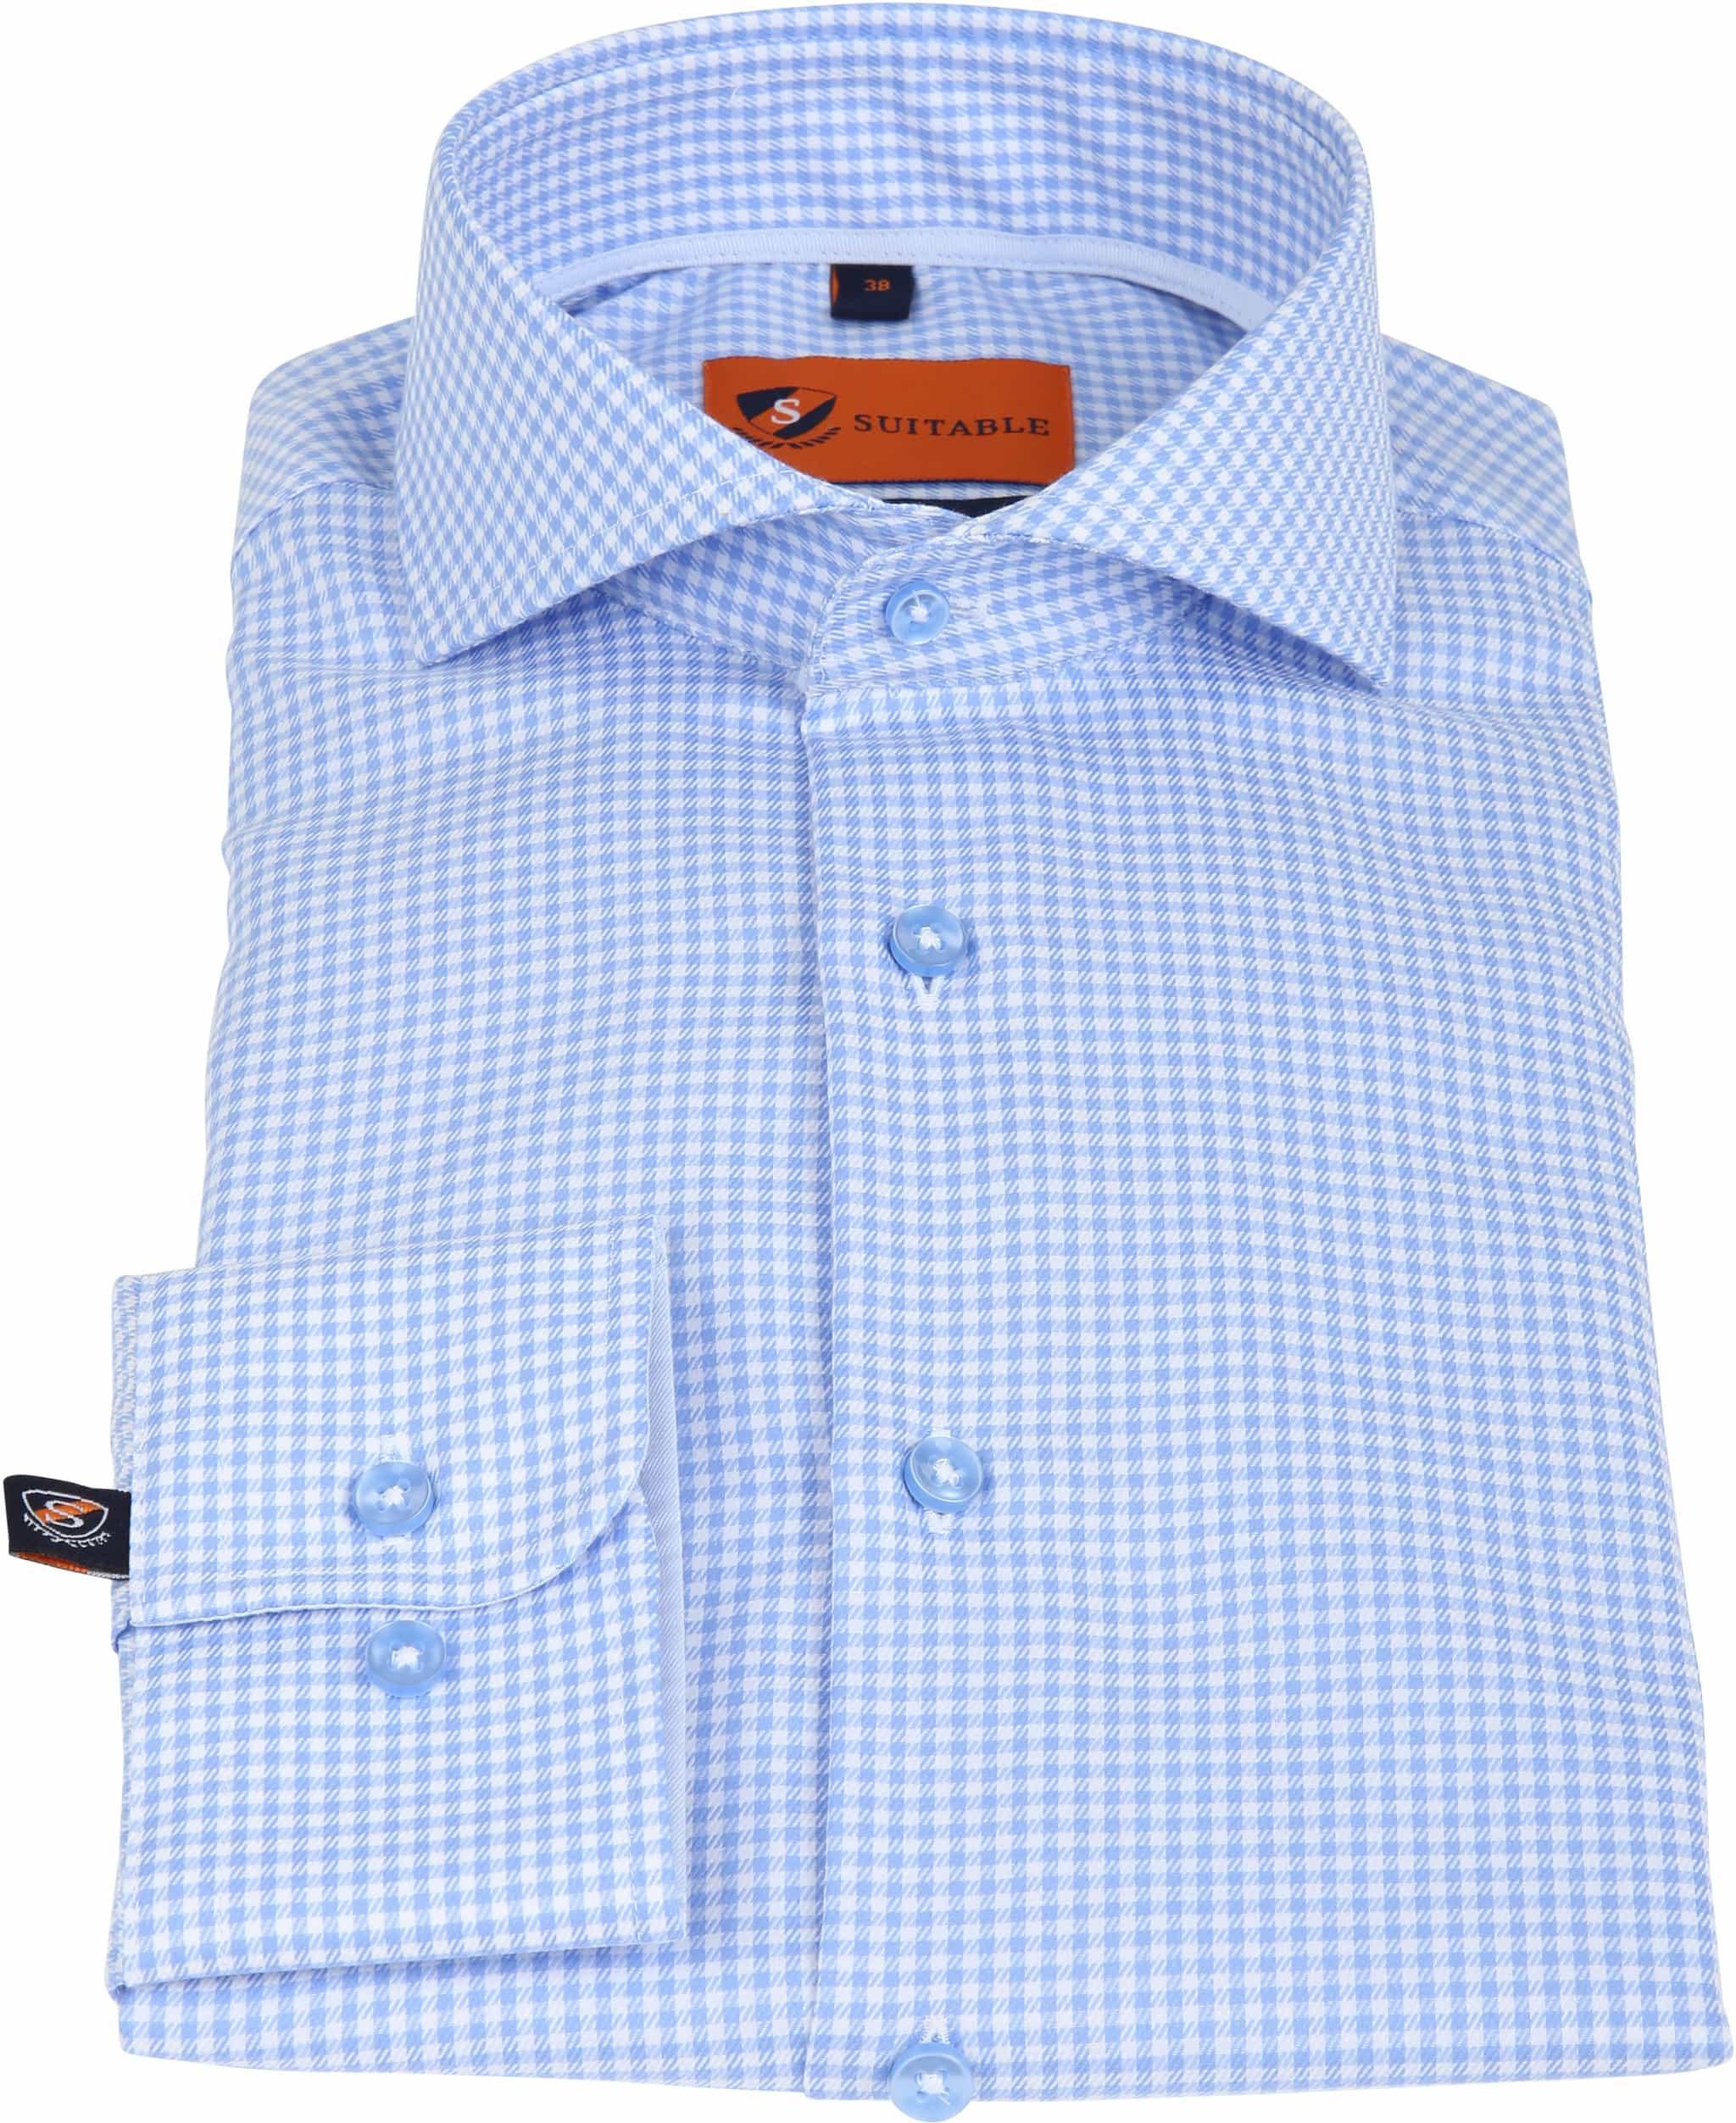 Suitable Overhemd Vichy Blue foto 1